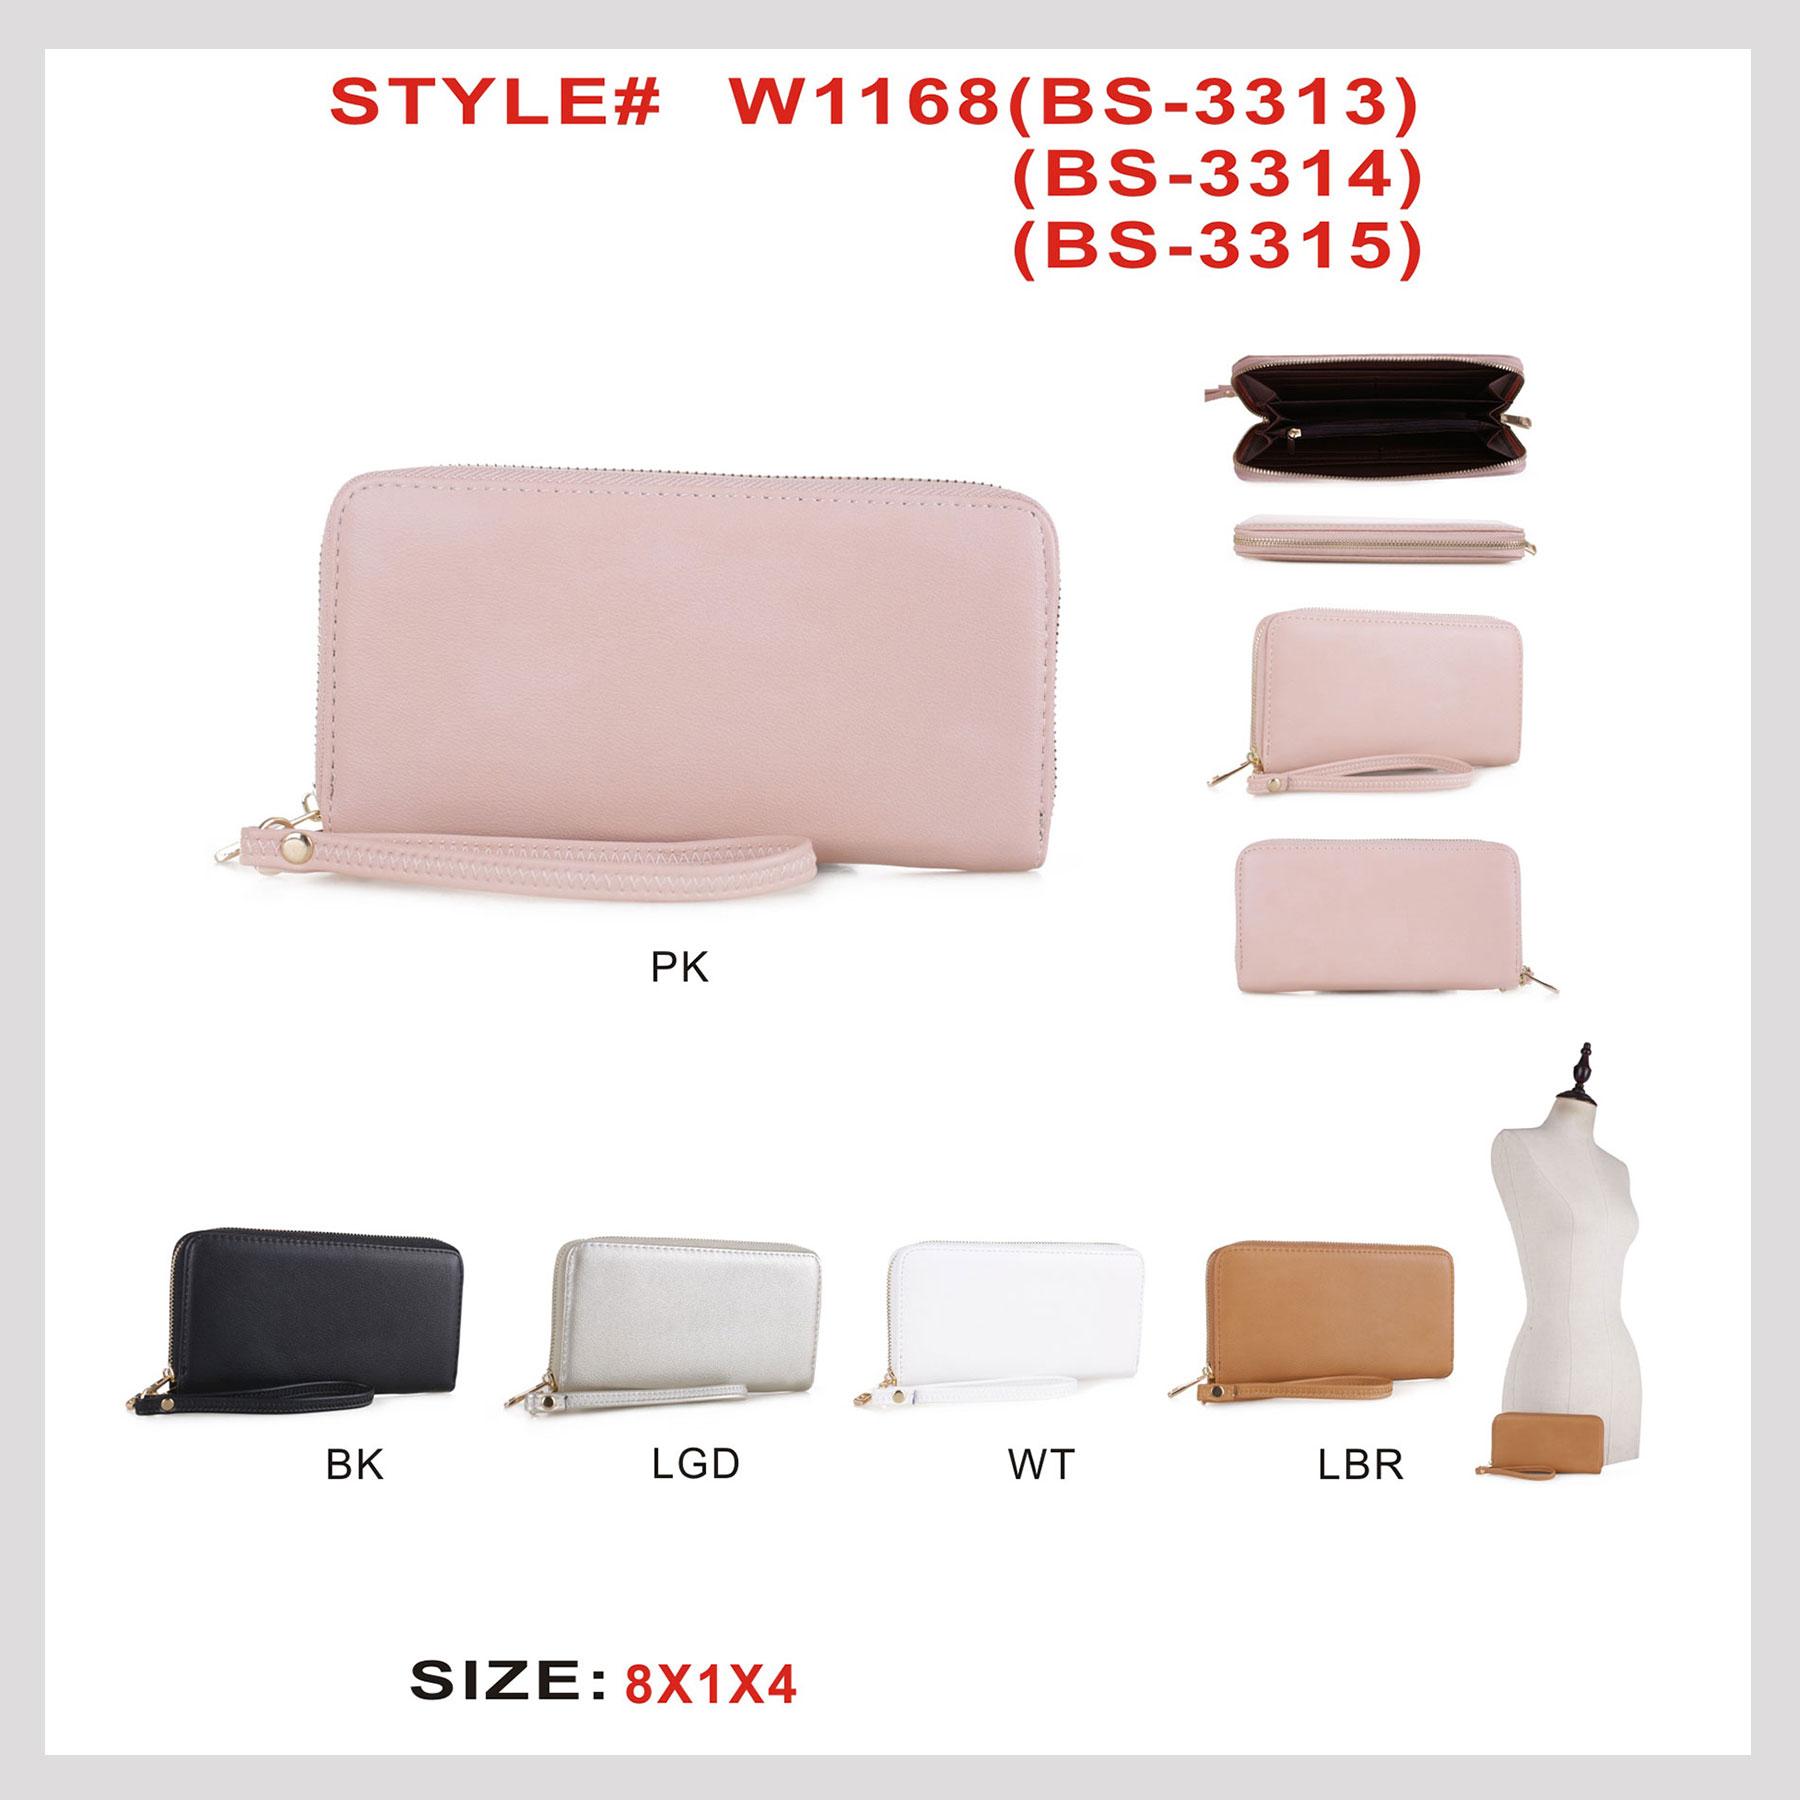 W1168(BS-3313-3315).jpg